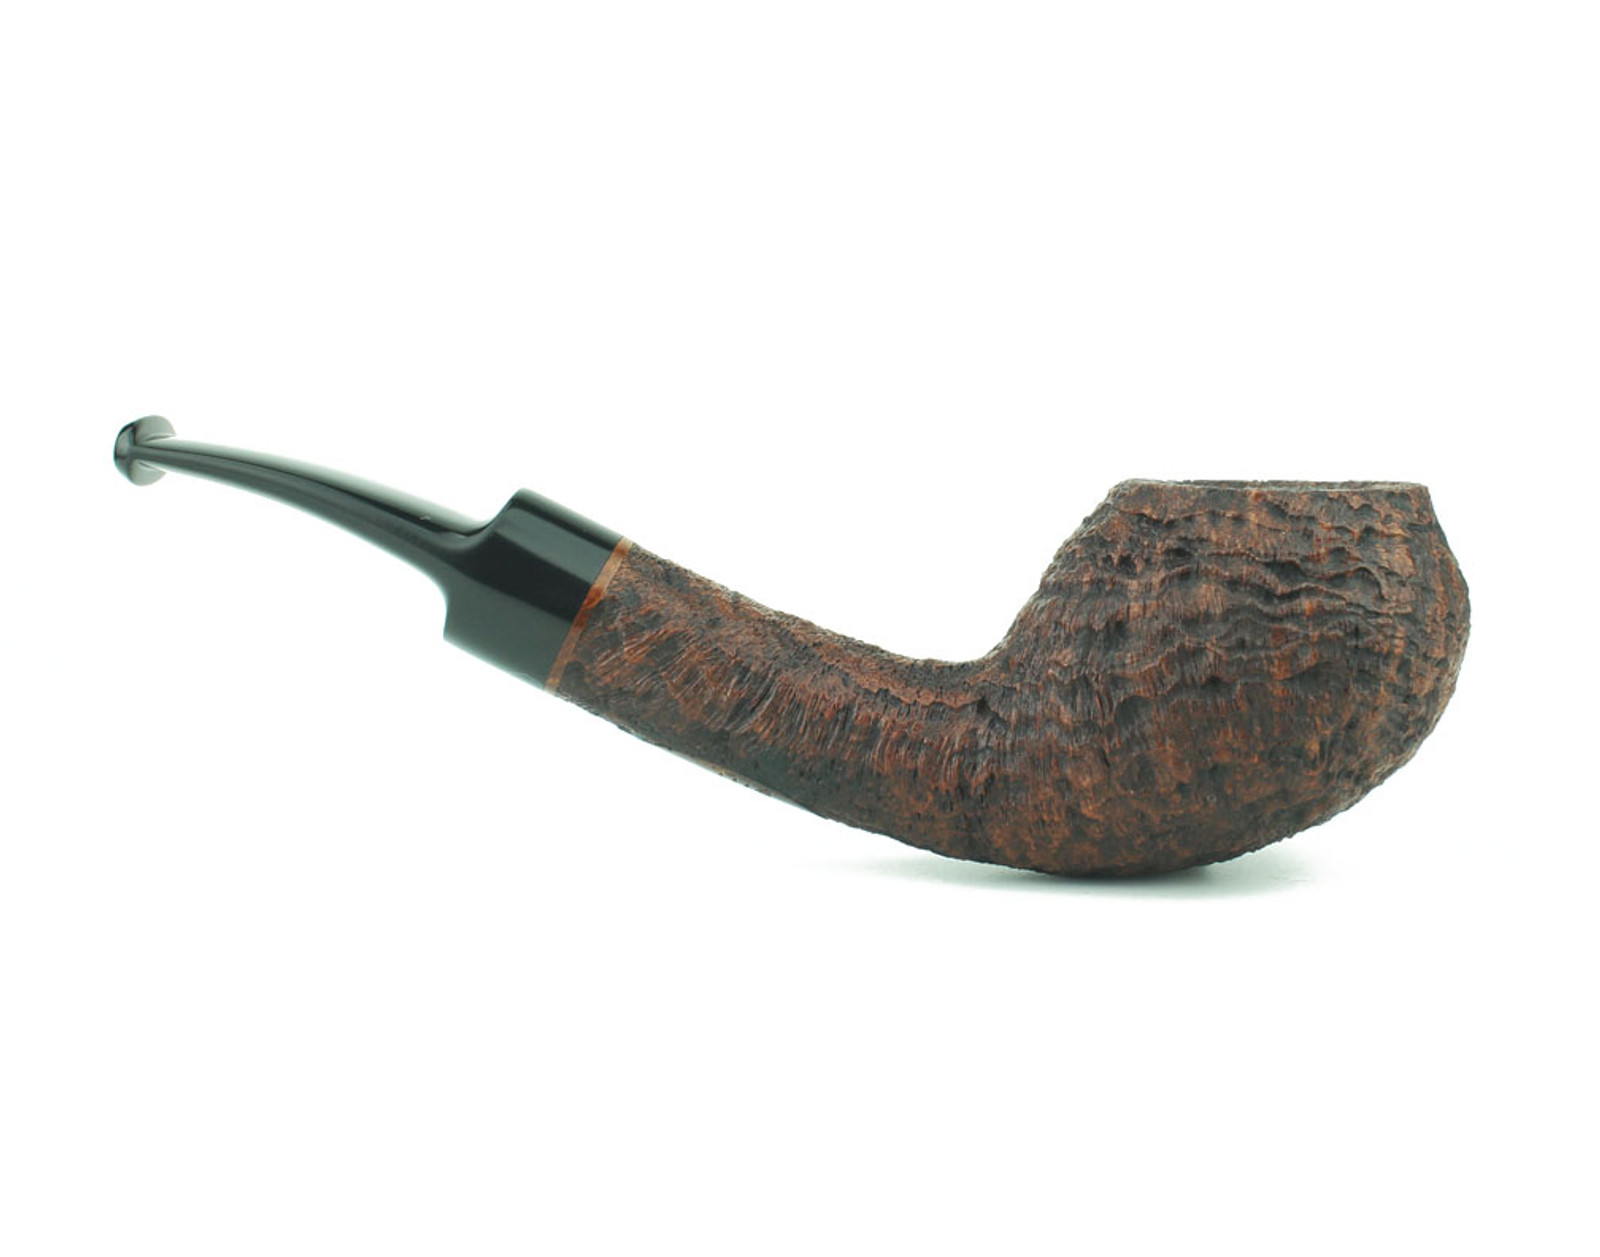 BWHBS02 - BriarWorks Handmade Bill Shalosky Brown Blast Bent Apple w/ Black Ebonite Stem